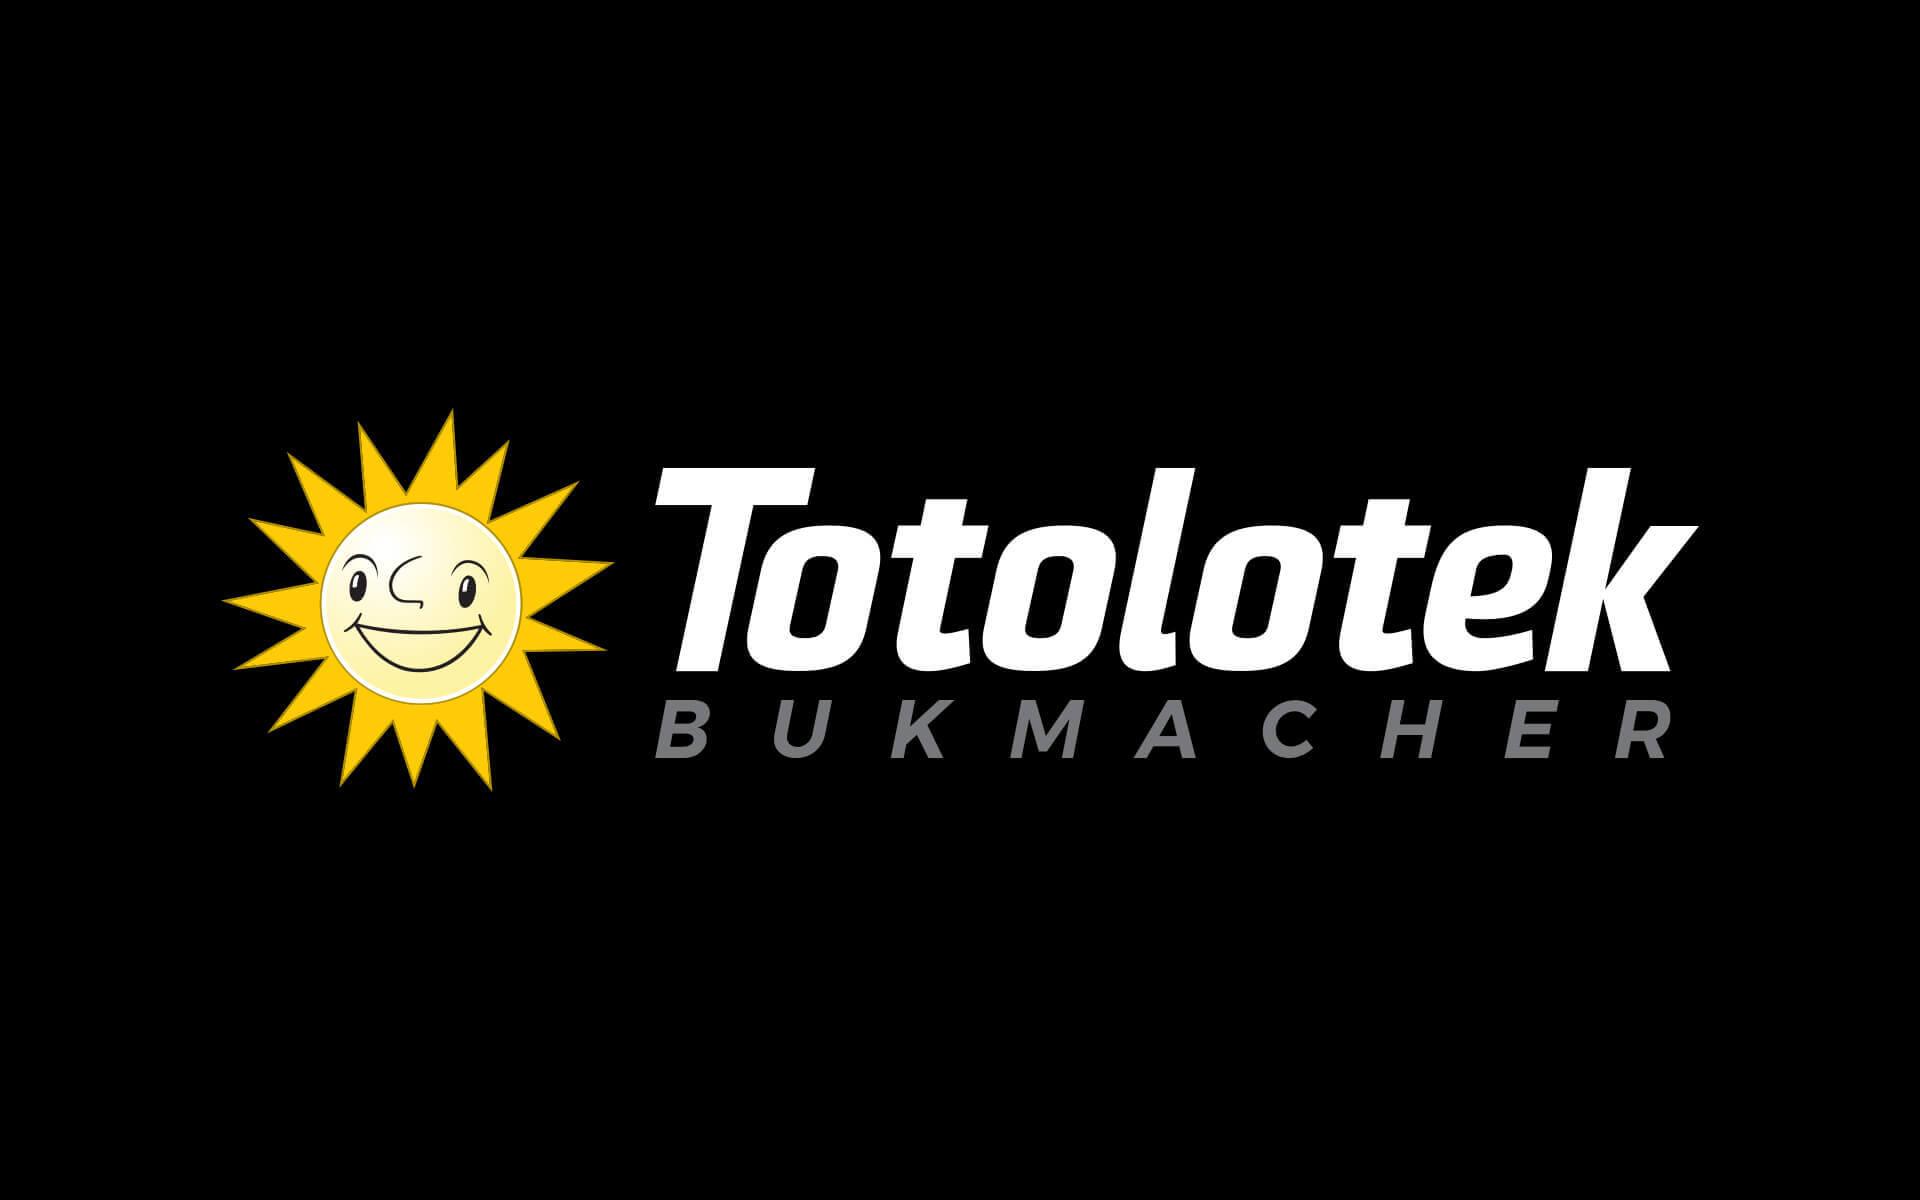 Totolotek Online